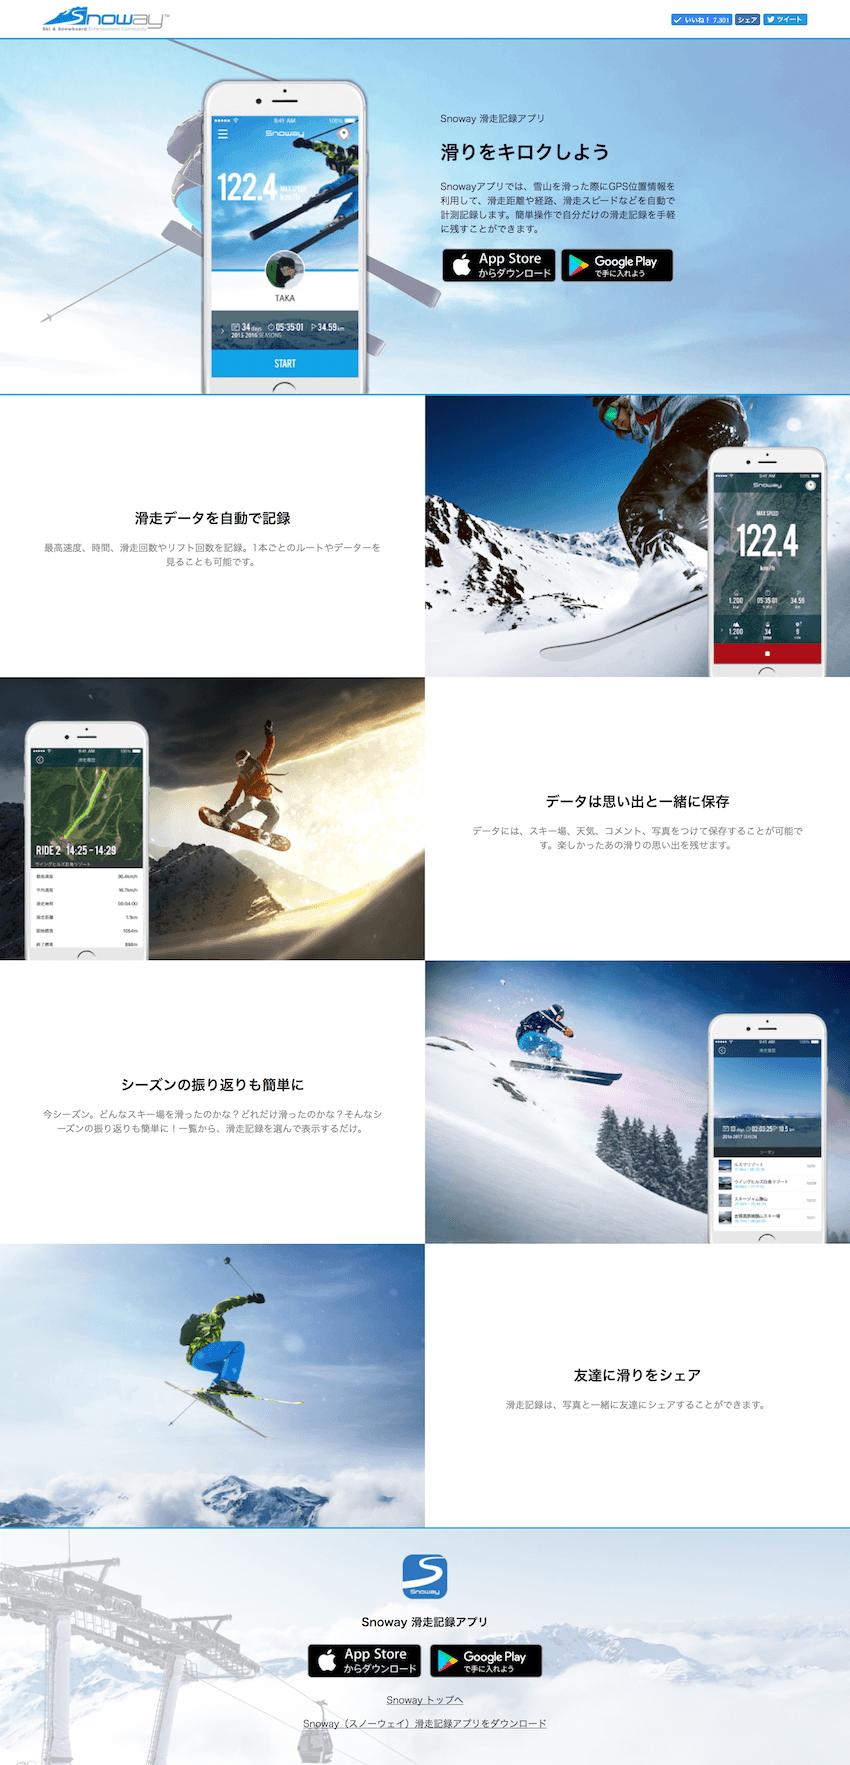 Snowayアプリ TOPページ